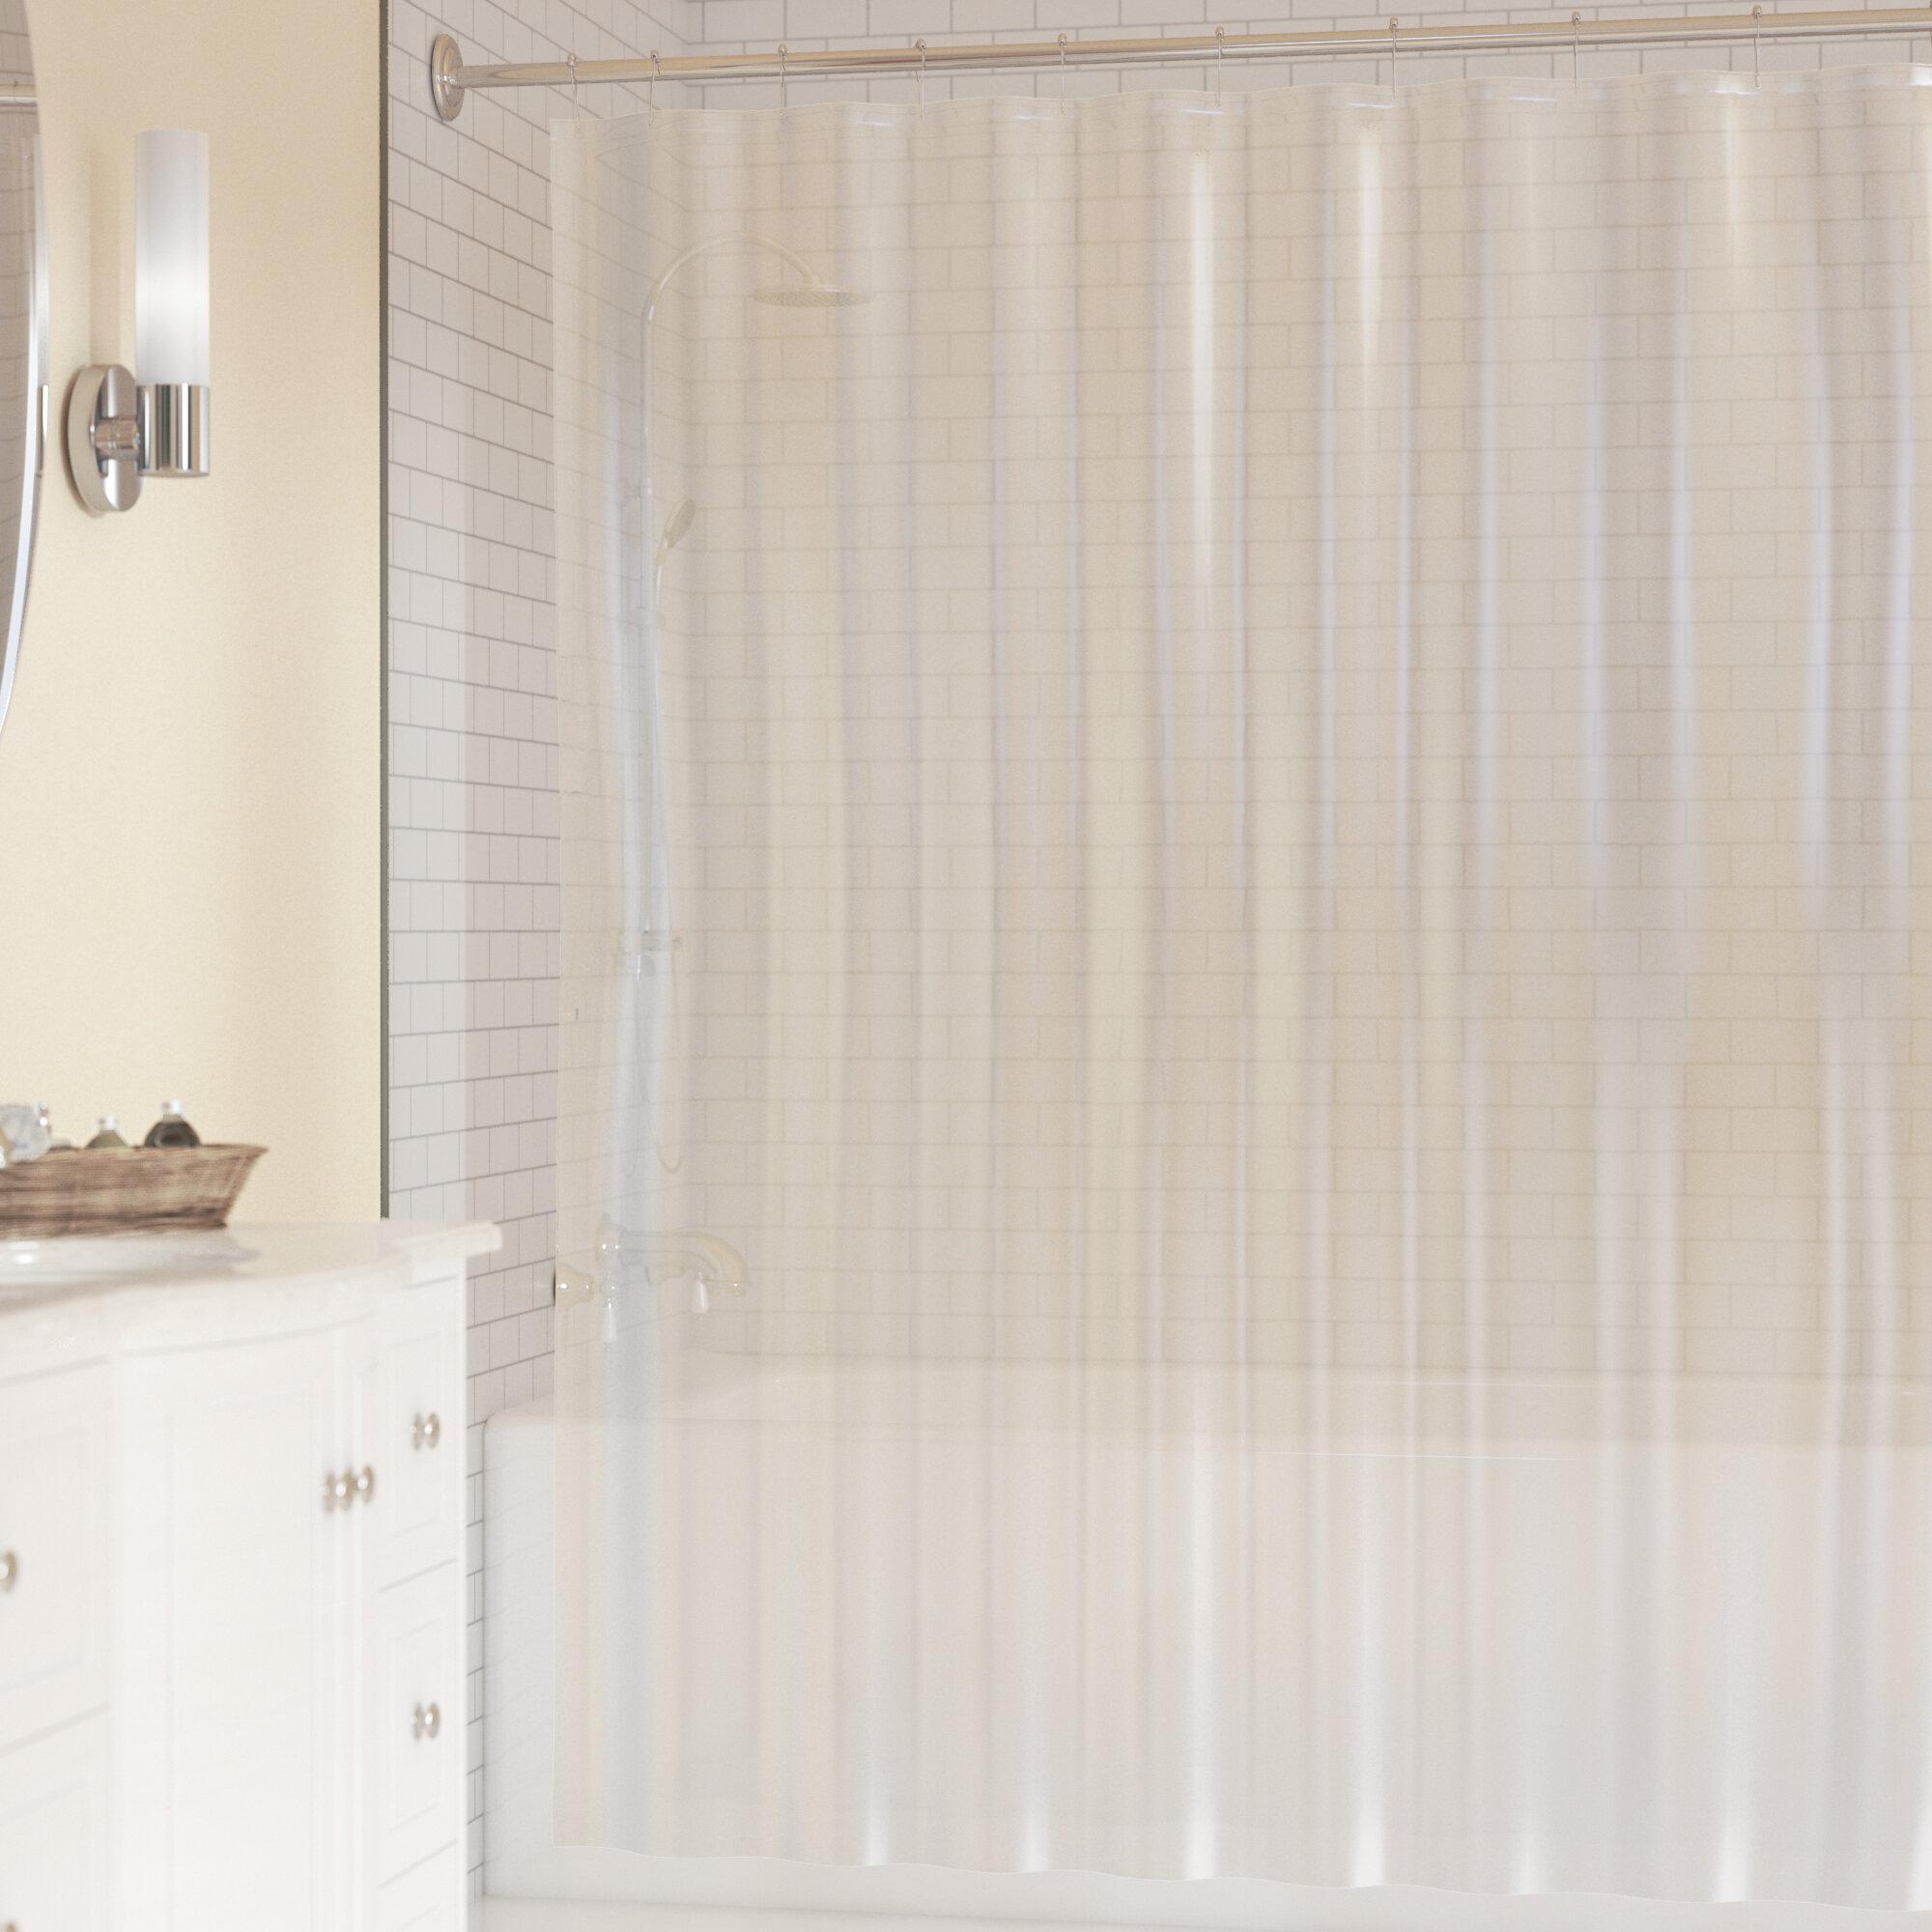 Symple Stuff PEVA Shower Curtain Liner & Reviews   Wayfair